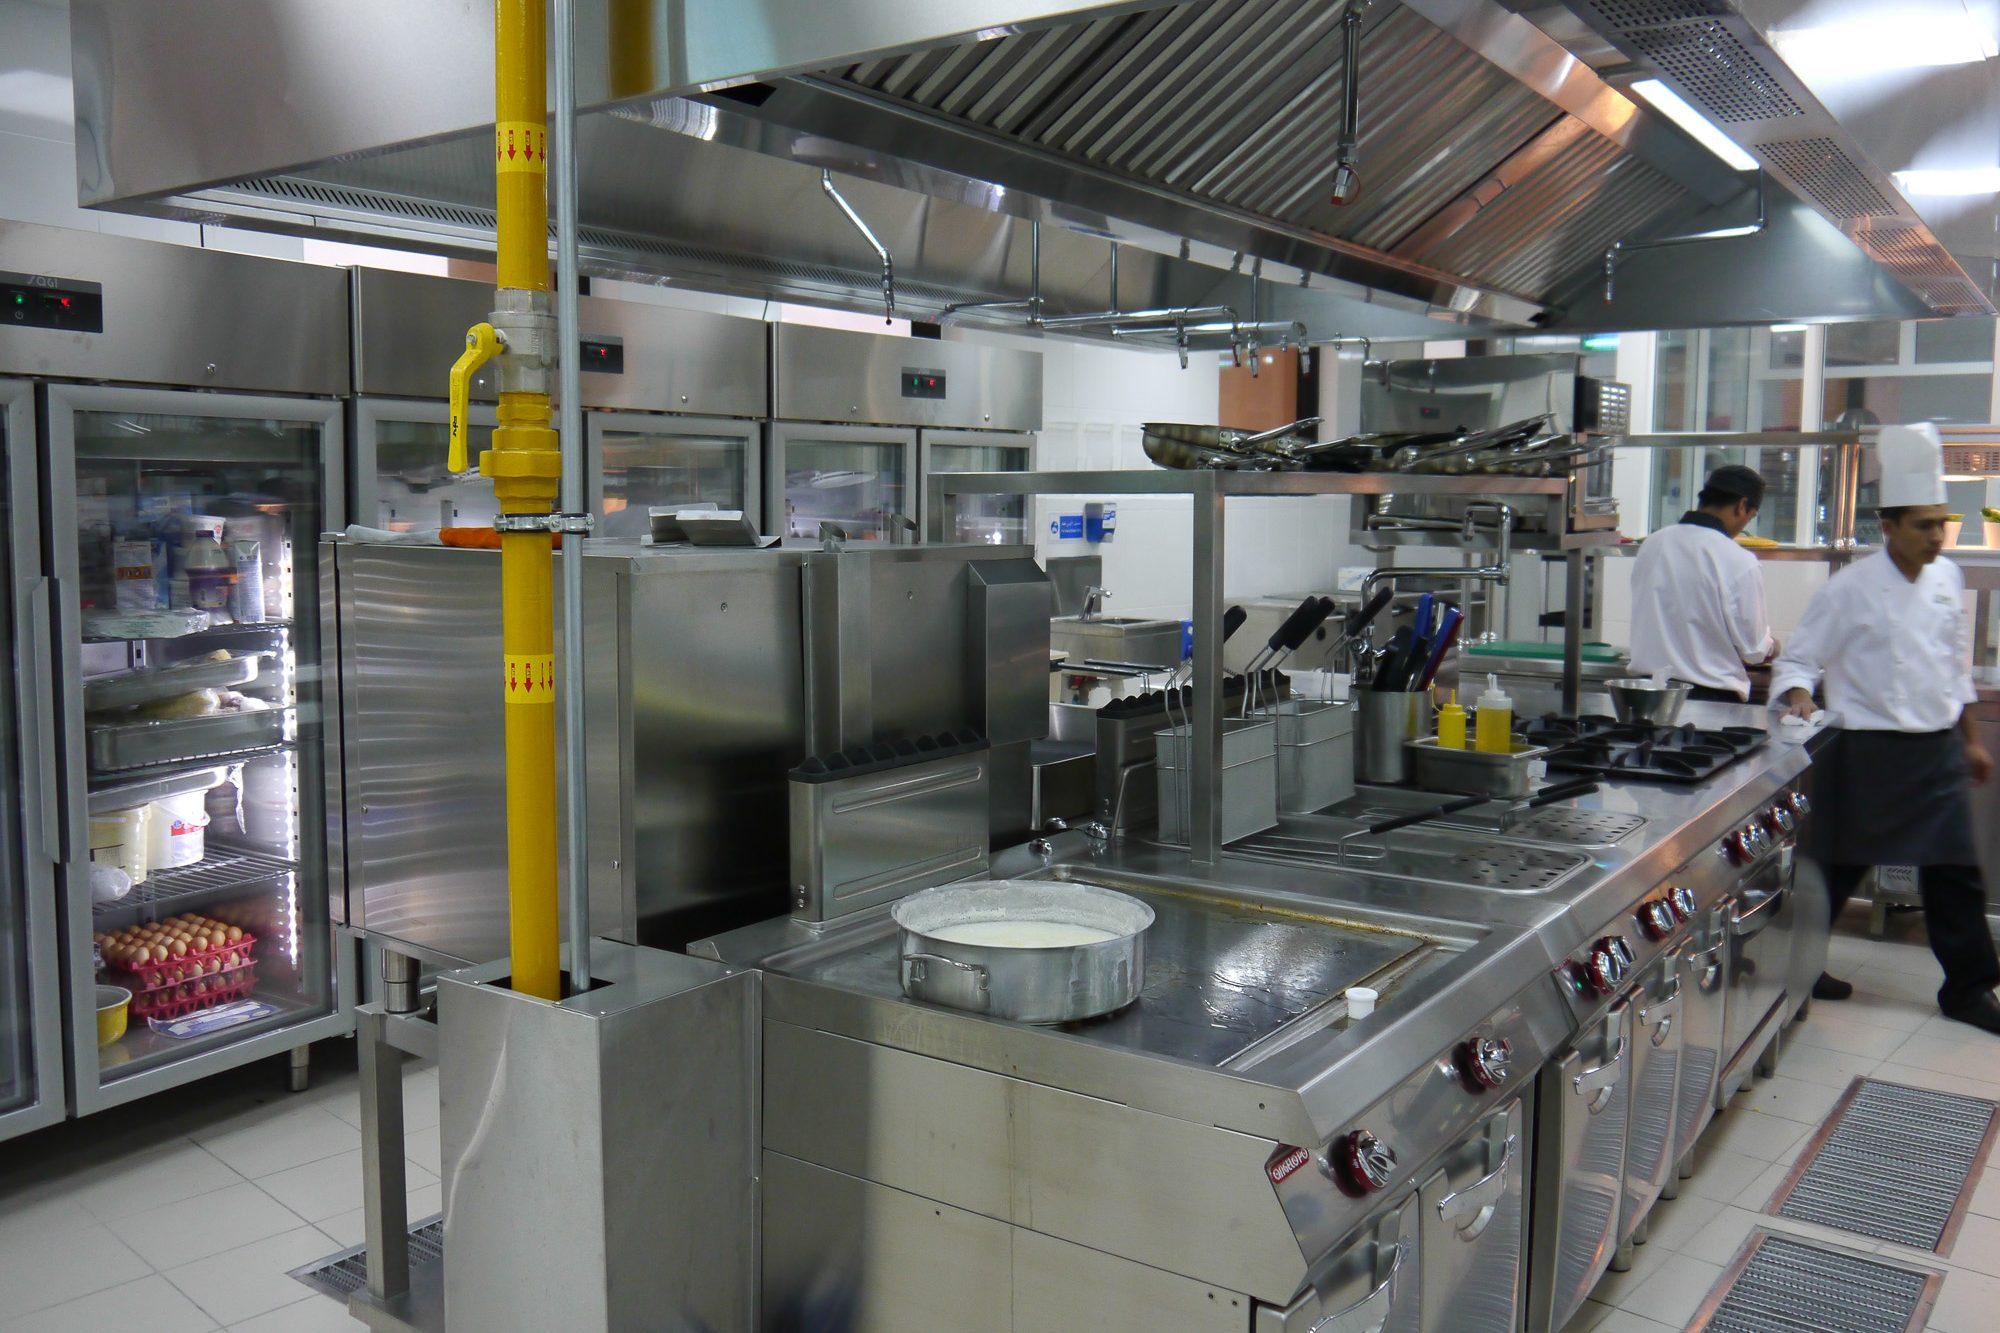 Italia_kitchen_-le_meridien_r-11